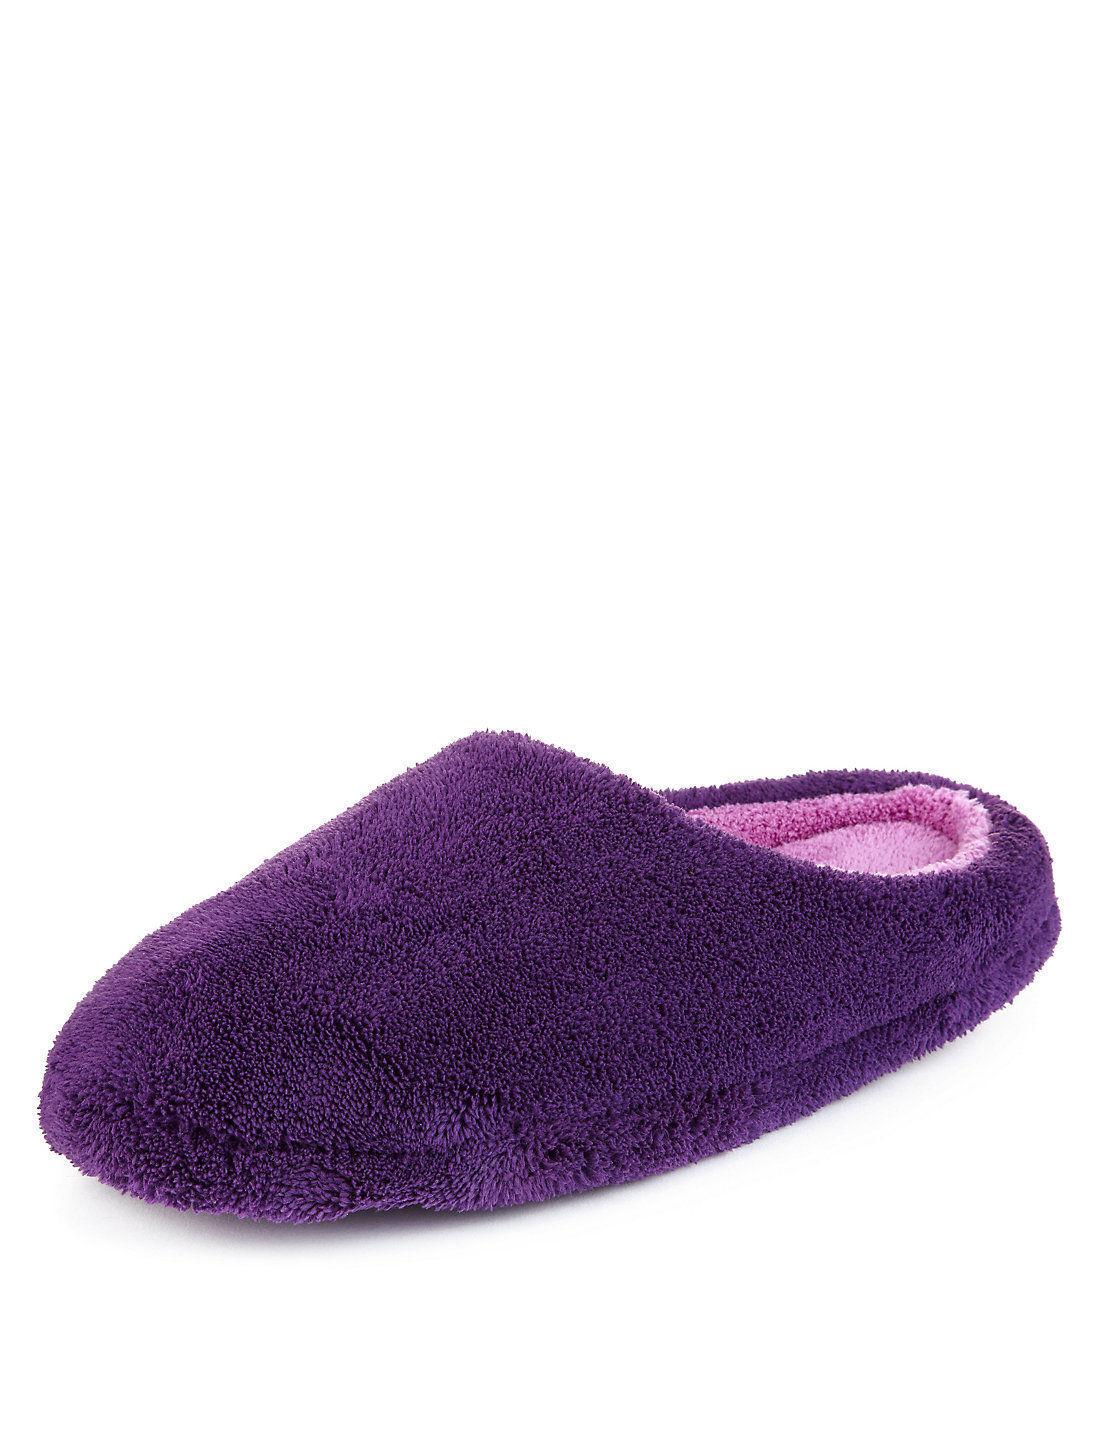 M\u0026S Women's Slippers   eBay